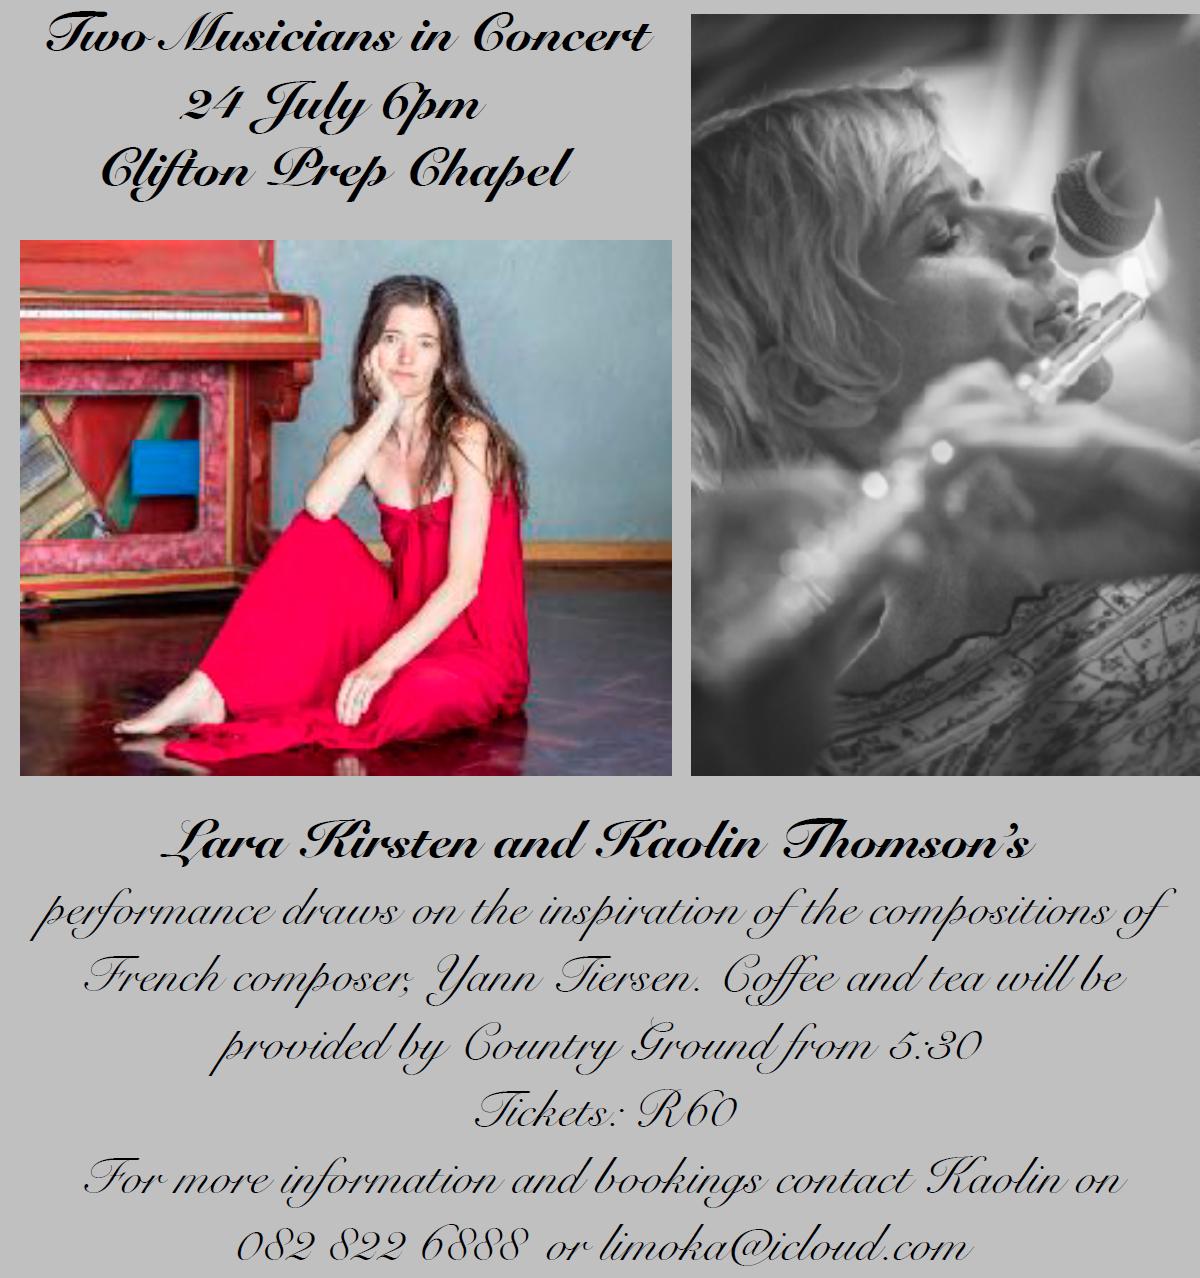 A Magical Musical Collaboration – Lara Kirsten and Kaolin Thomson